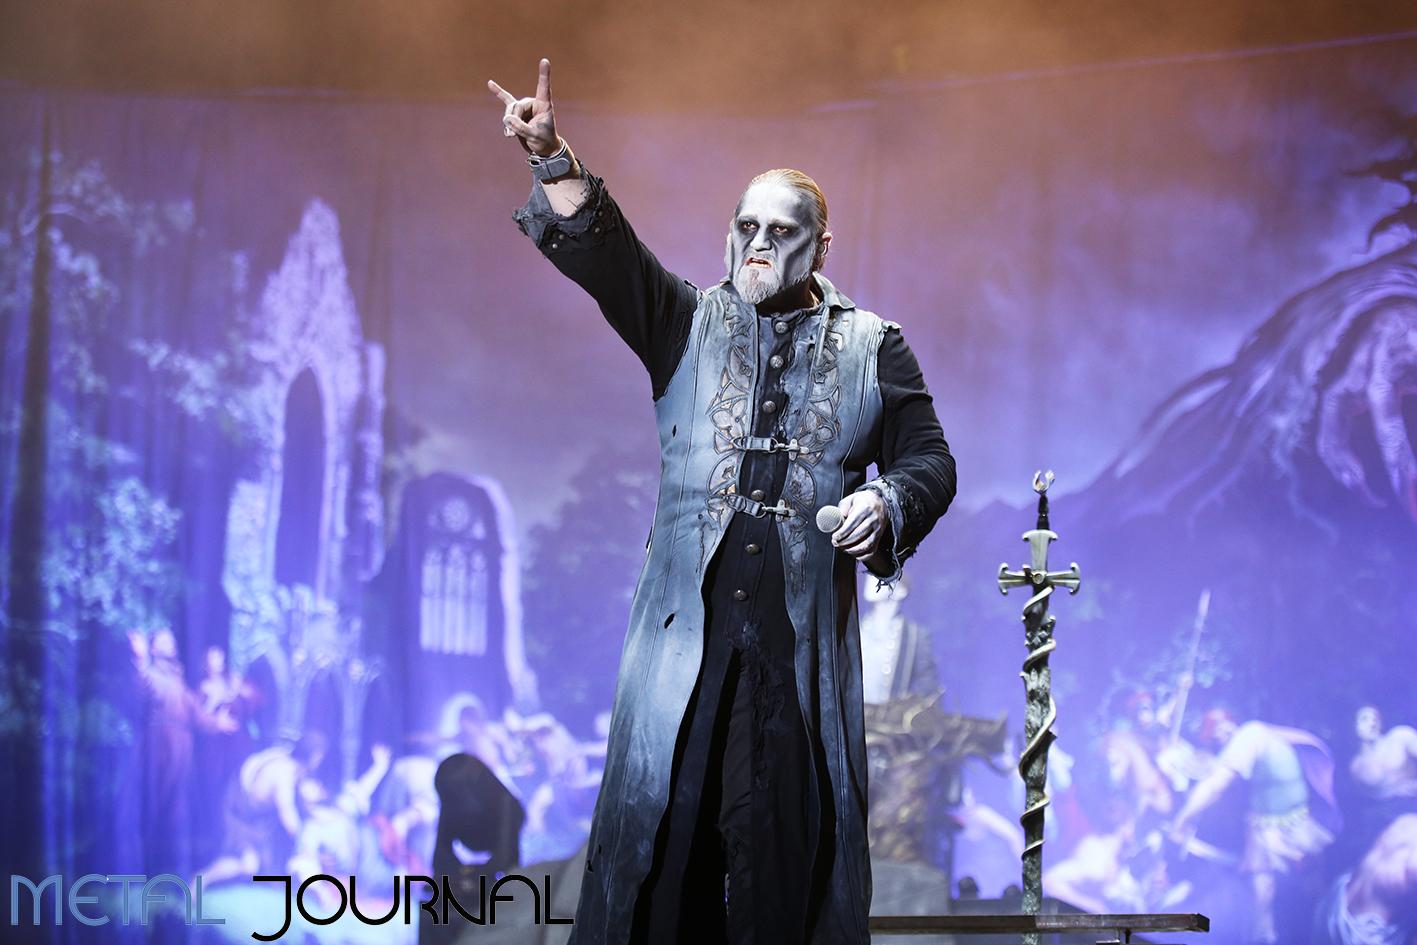 powerwolf - metal journal rock fest barcelona 2019 pic 7